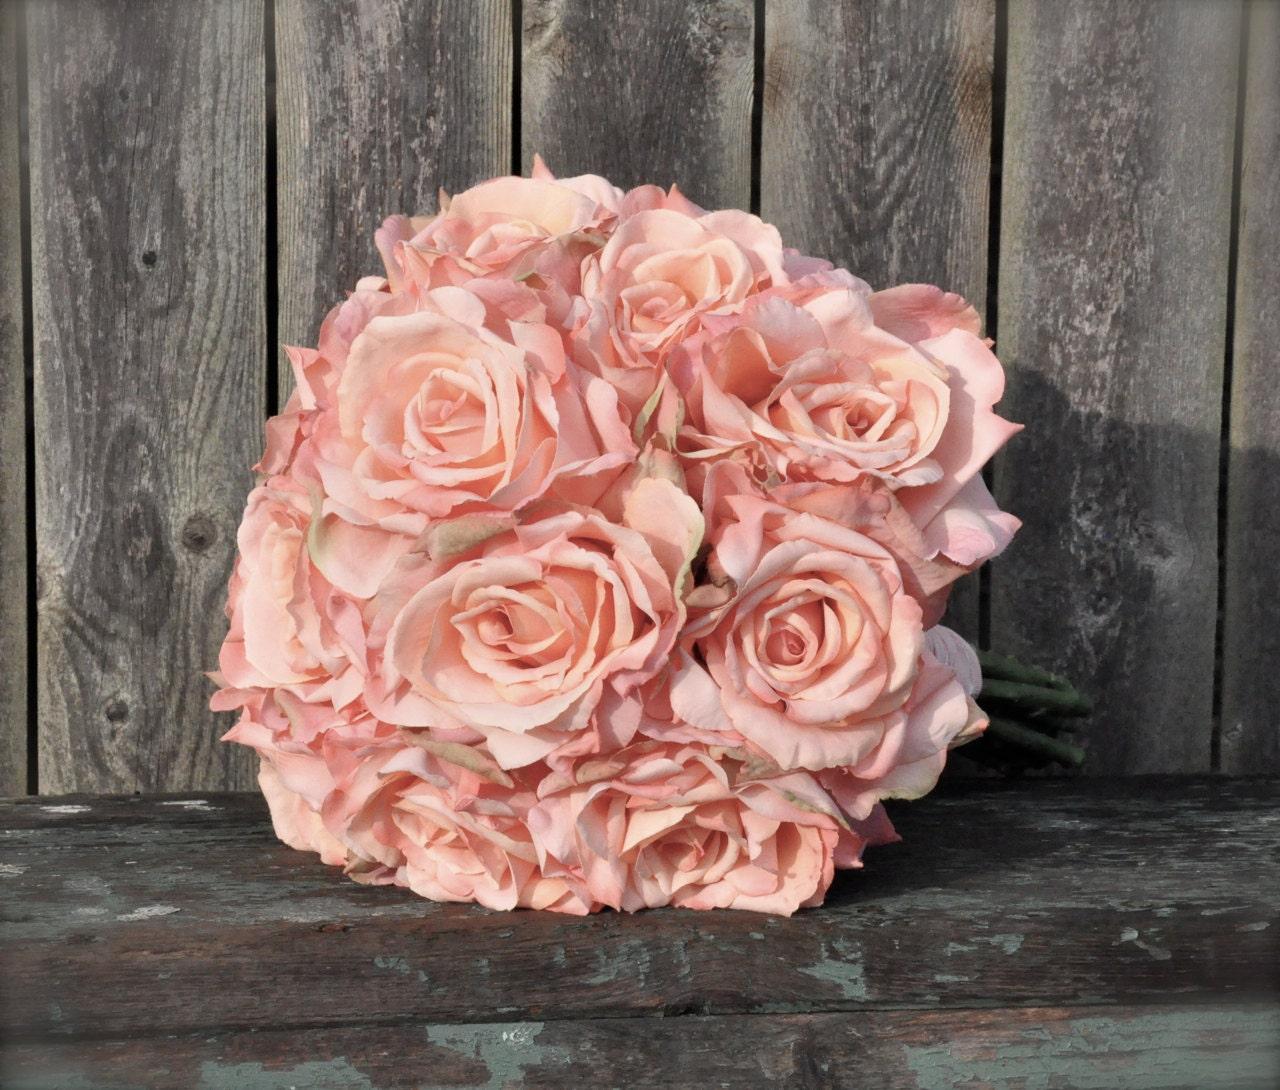 Blush Wedding Flowers: Blush Pink Rose Wedding Bouquet Made Of Silk Roses. Catherine